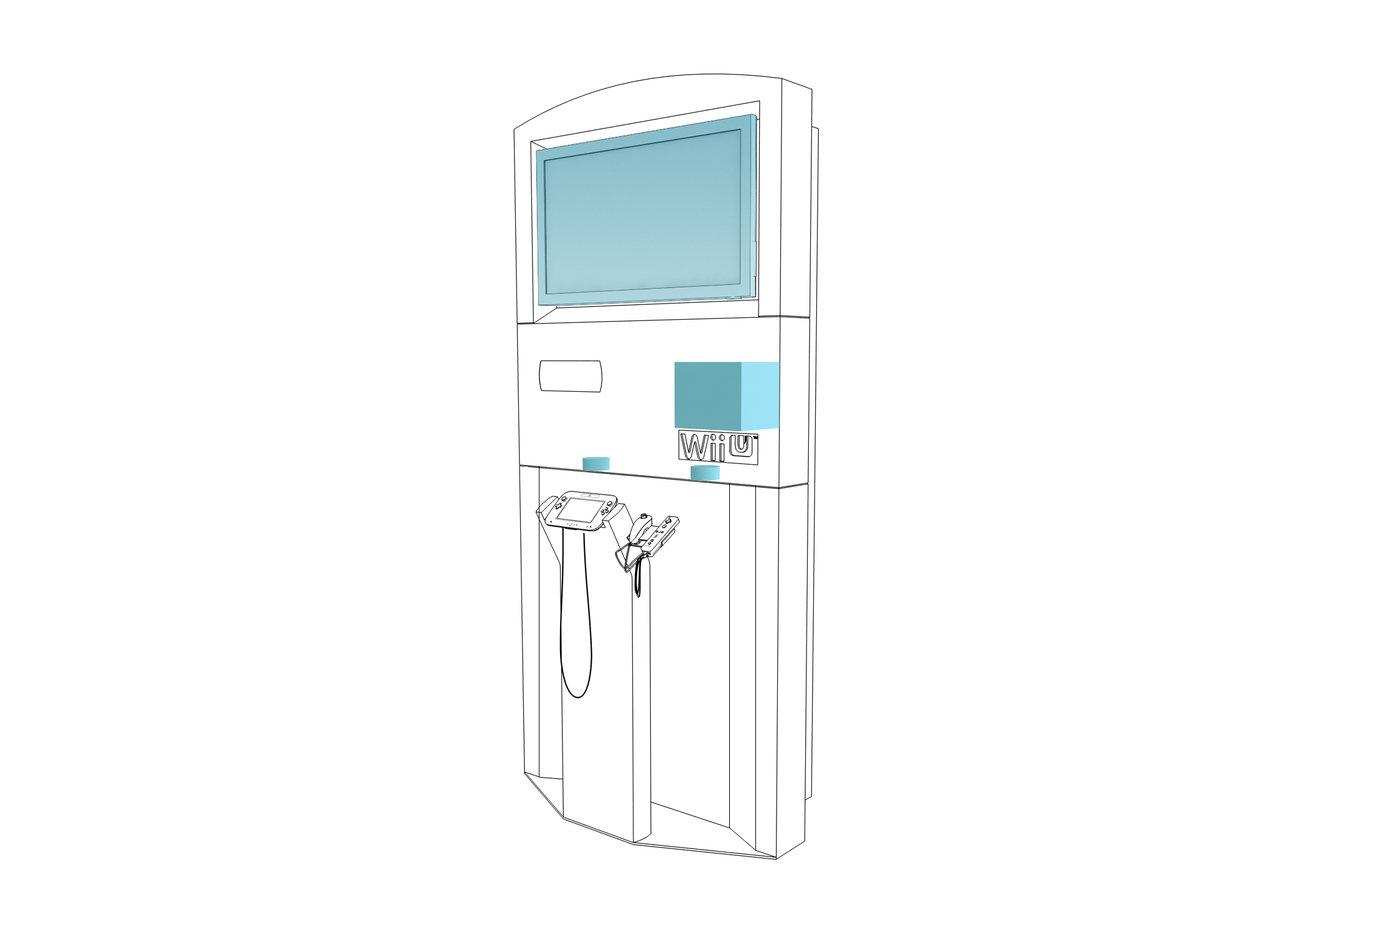 My Wii U